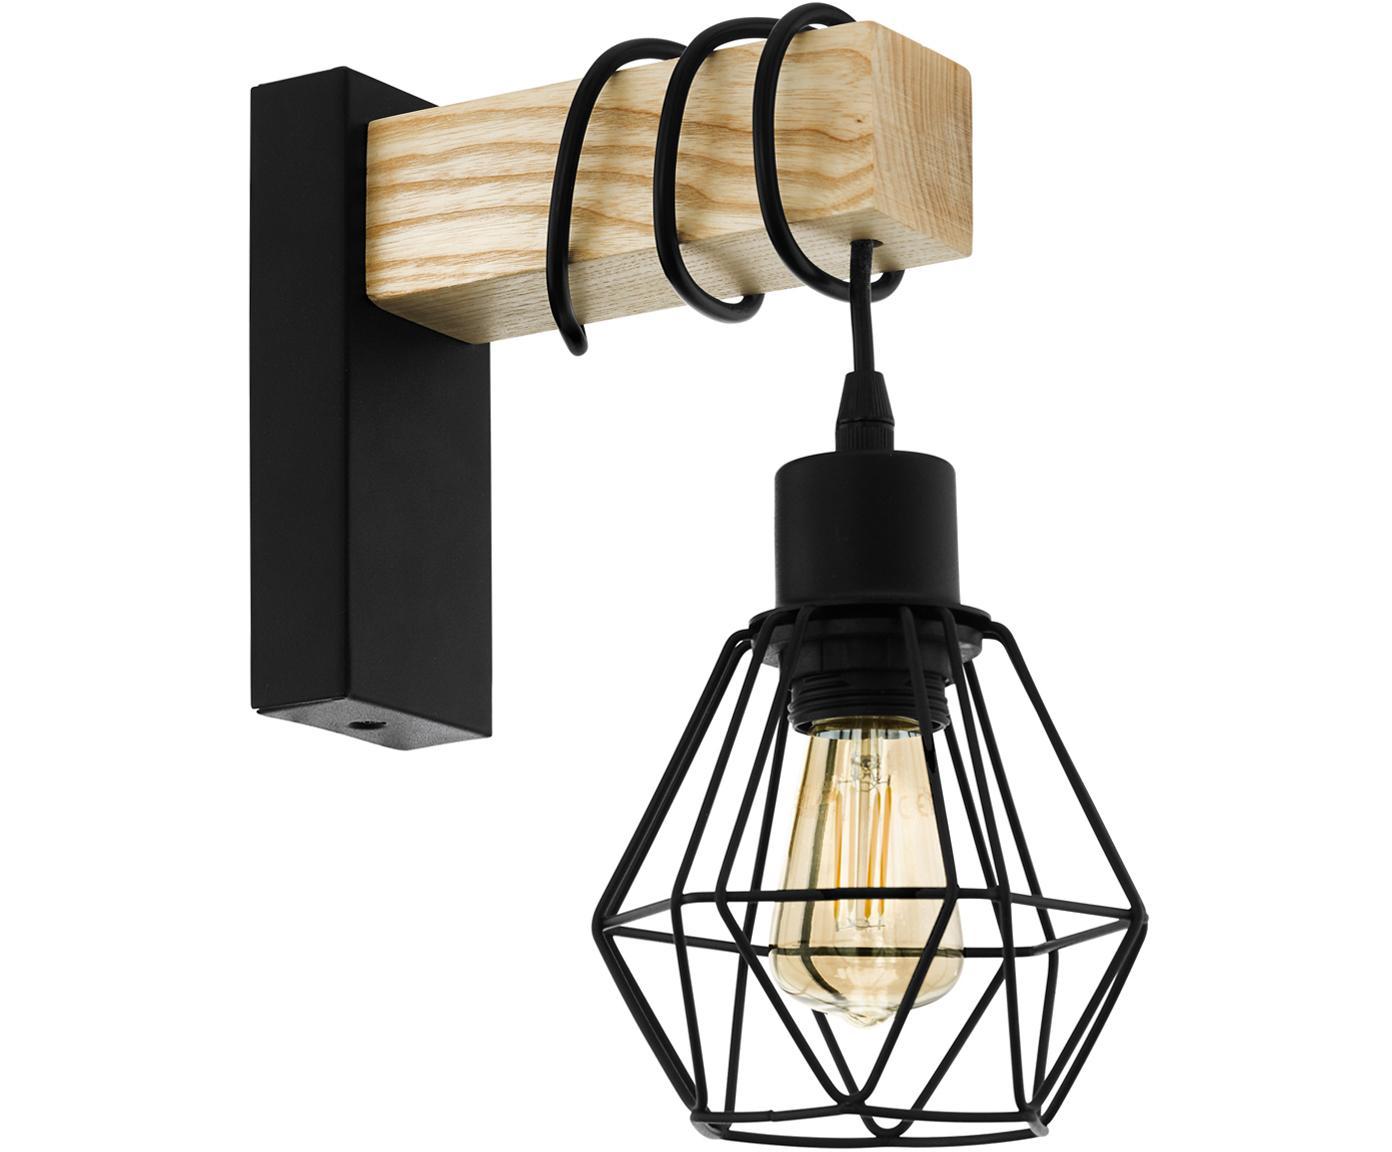 Lampada da parete Townshend, Nero, legno, Larg. 14 x Alt. 25 cm